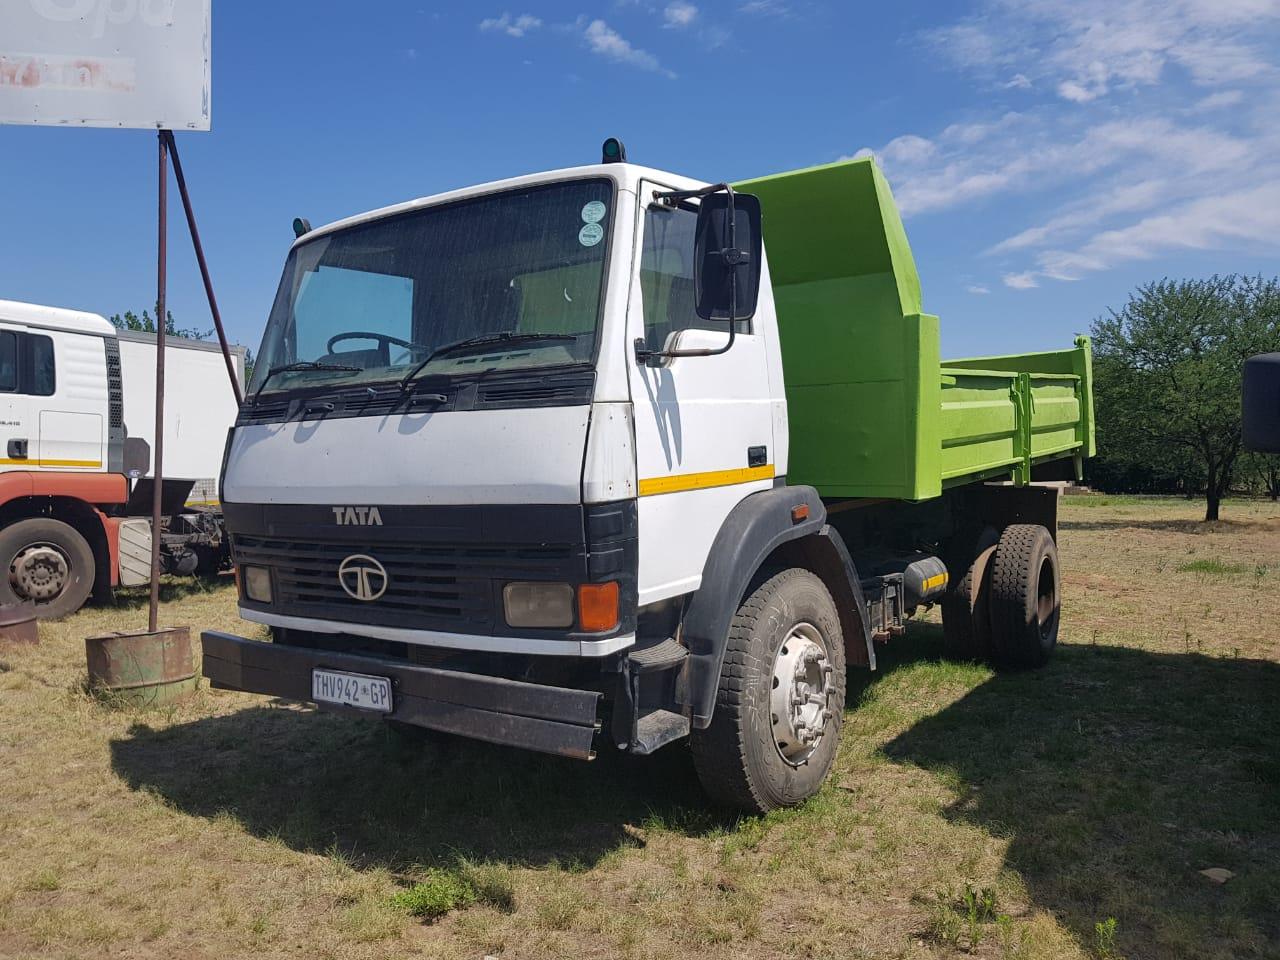 Tata 1518c 6cube tipper truck on special!! | Junk Mail